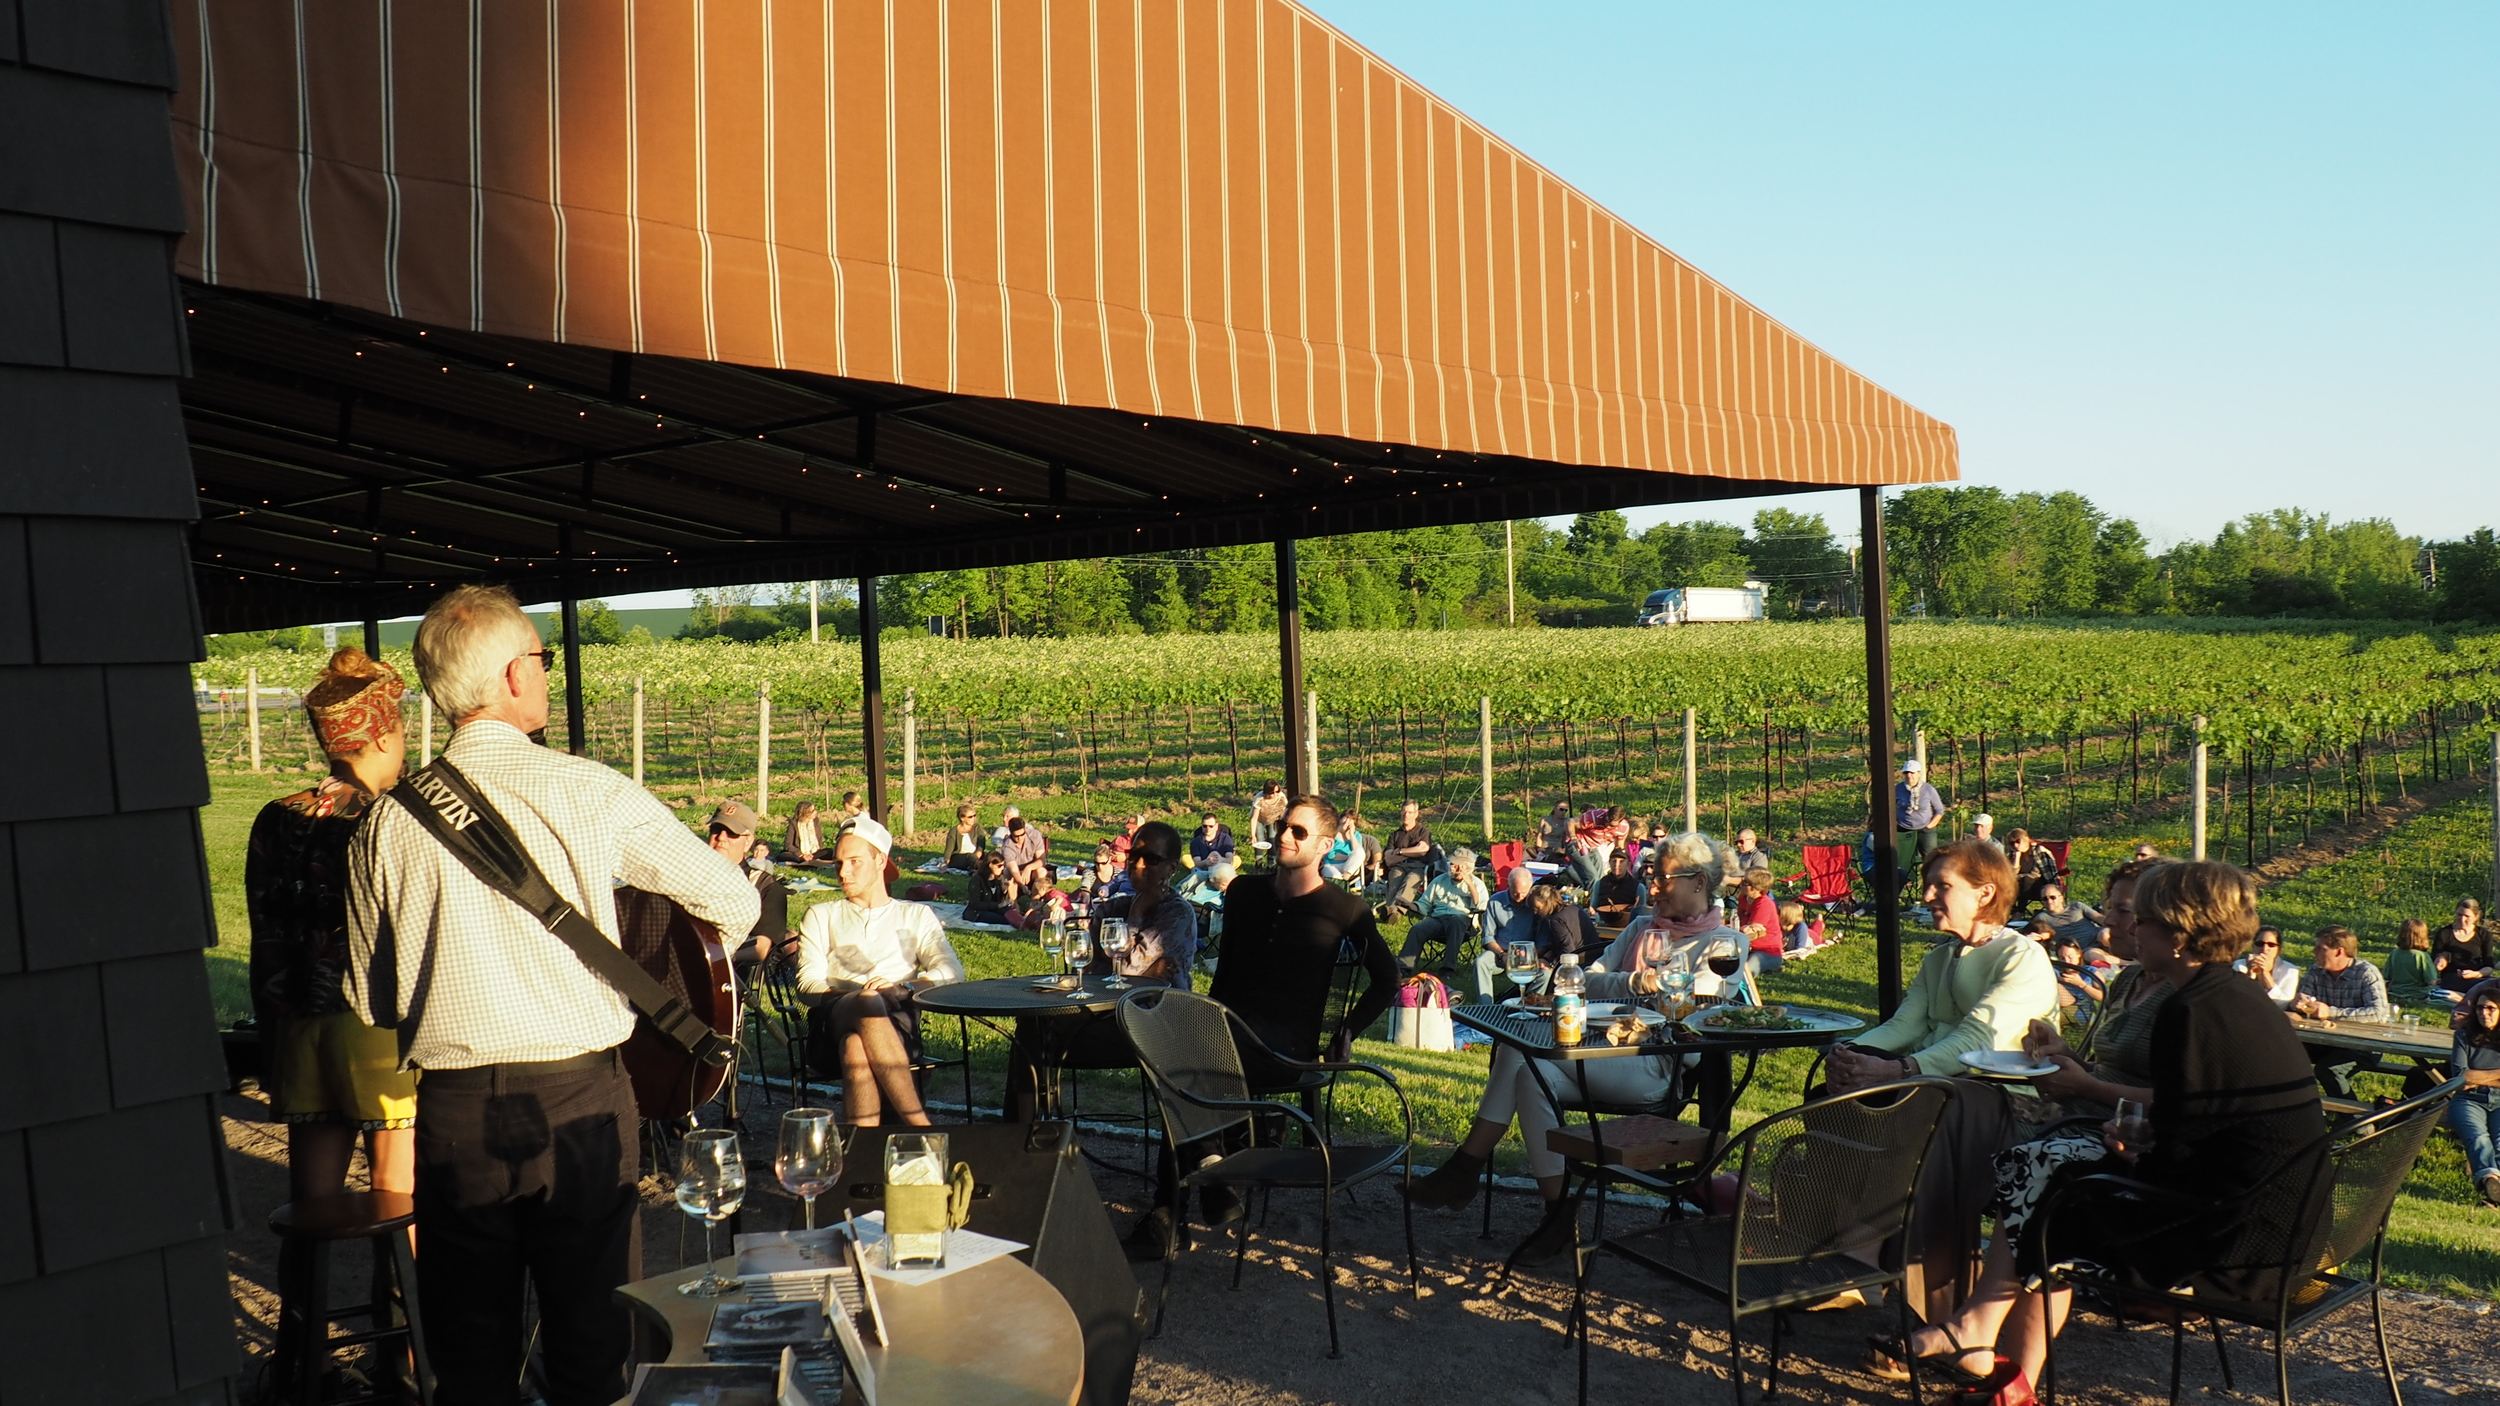 Sunny vineyard event outside